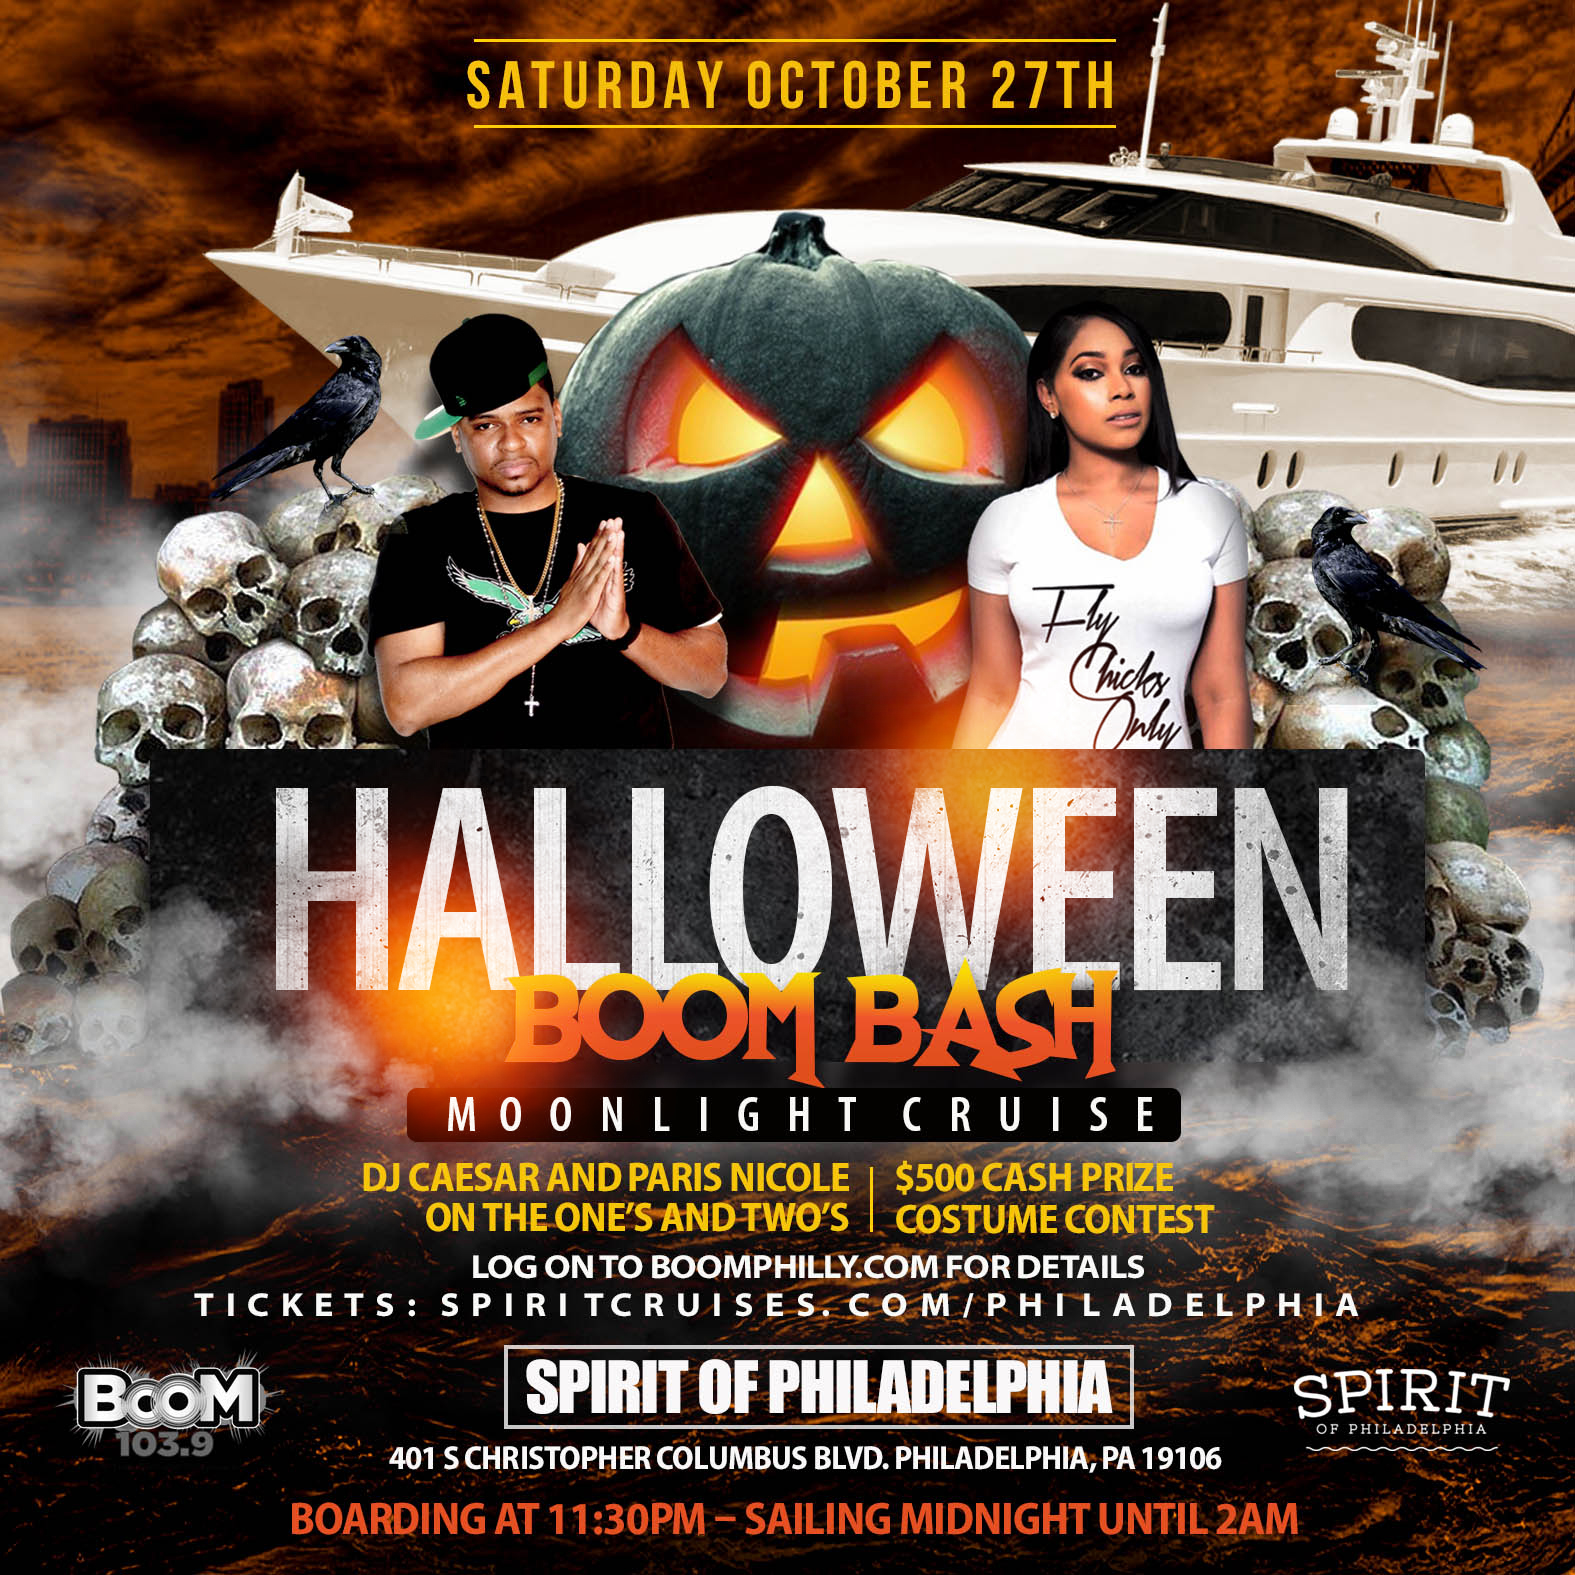 Boom Bash Halloween Moonlight Cruise